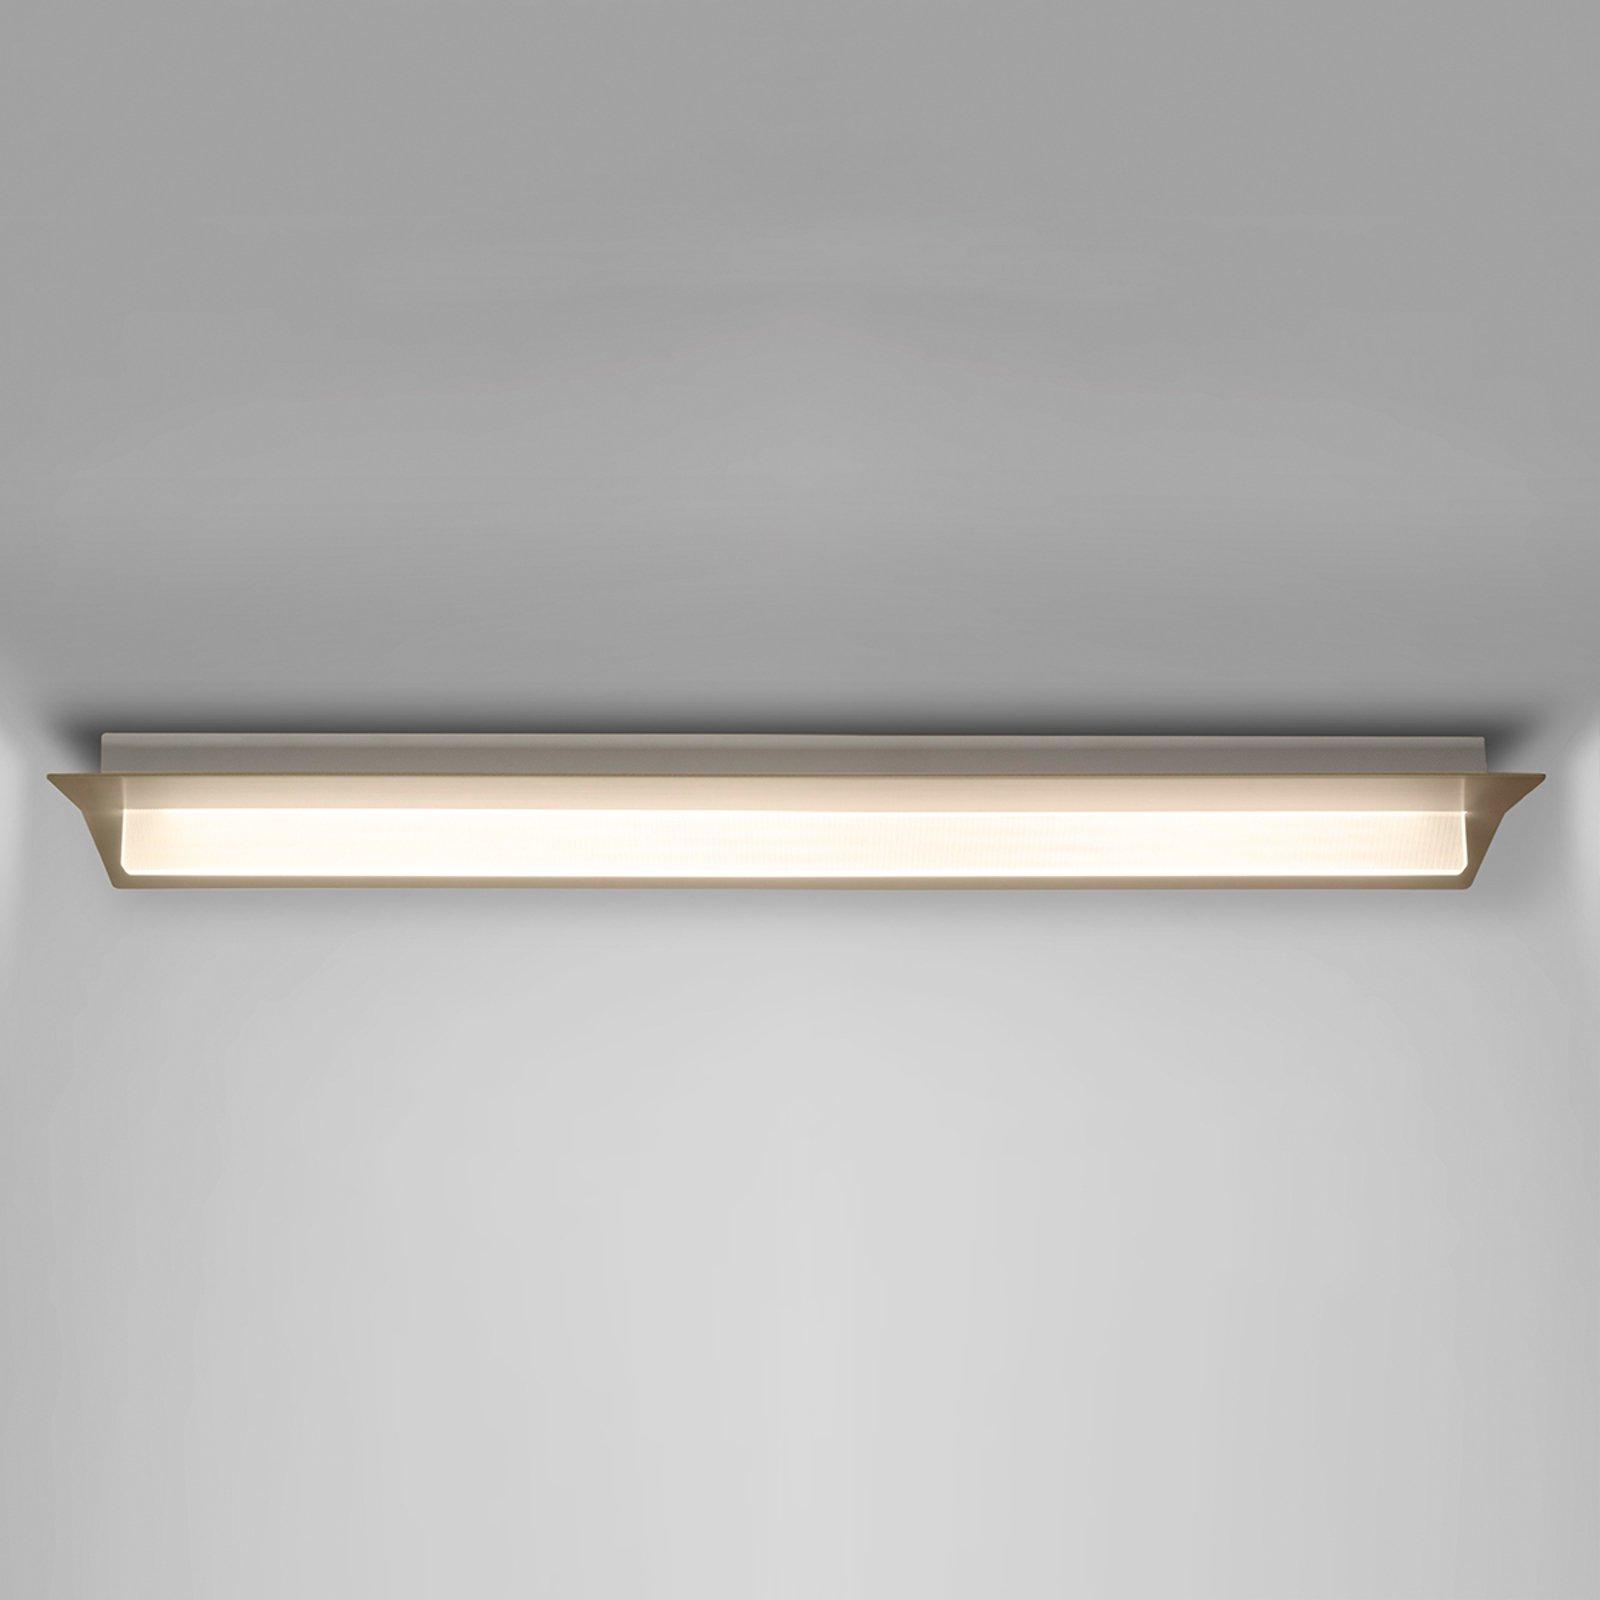 Flurry LED-taklampe, 100 cm, bronse